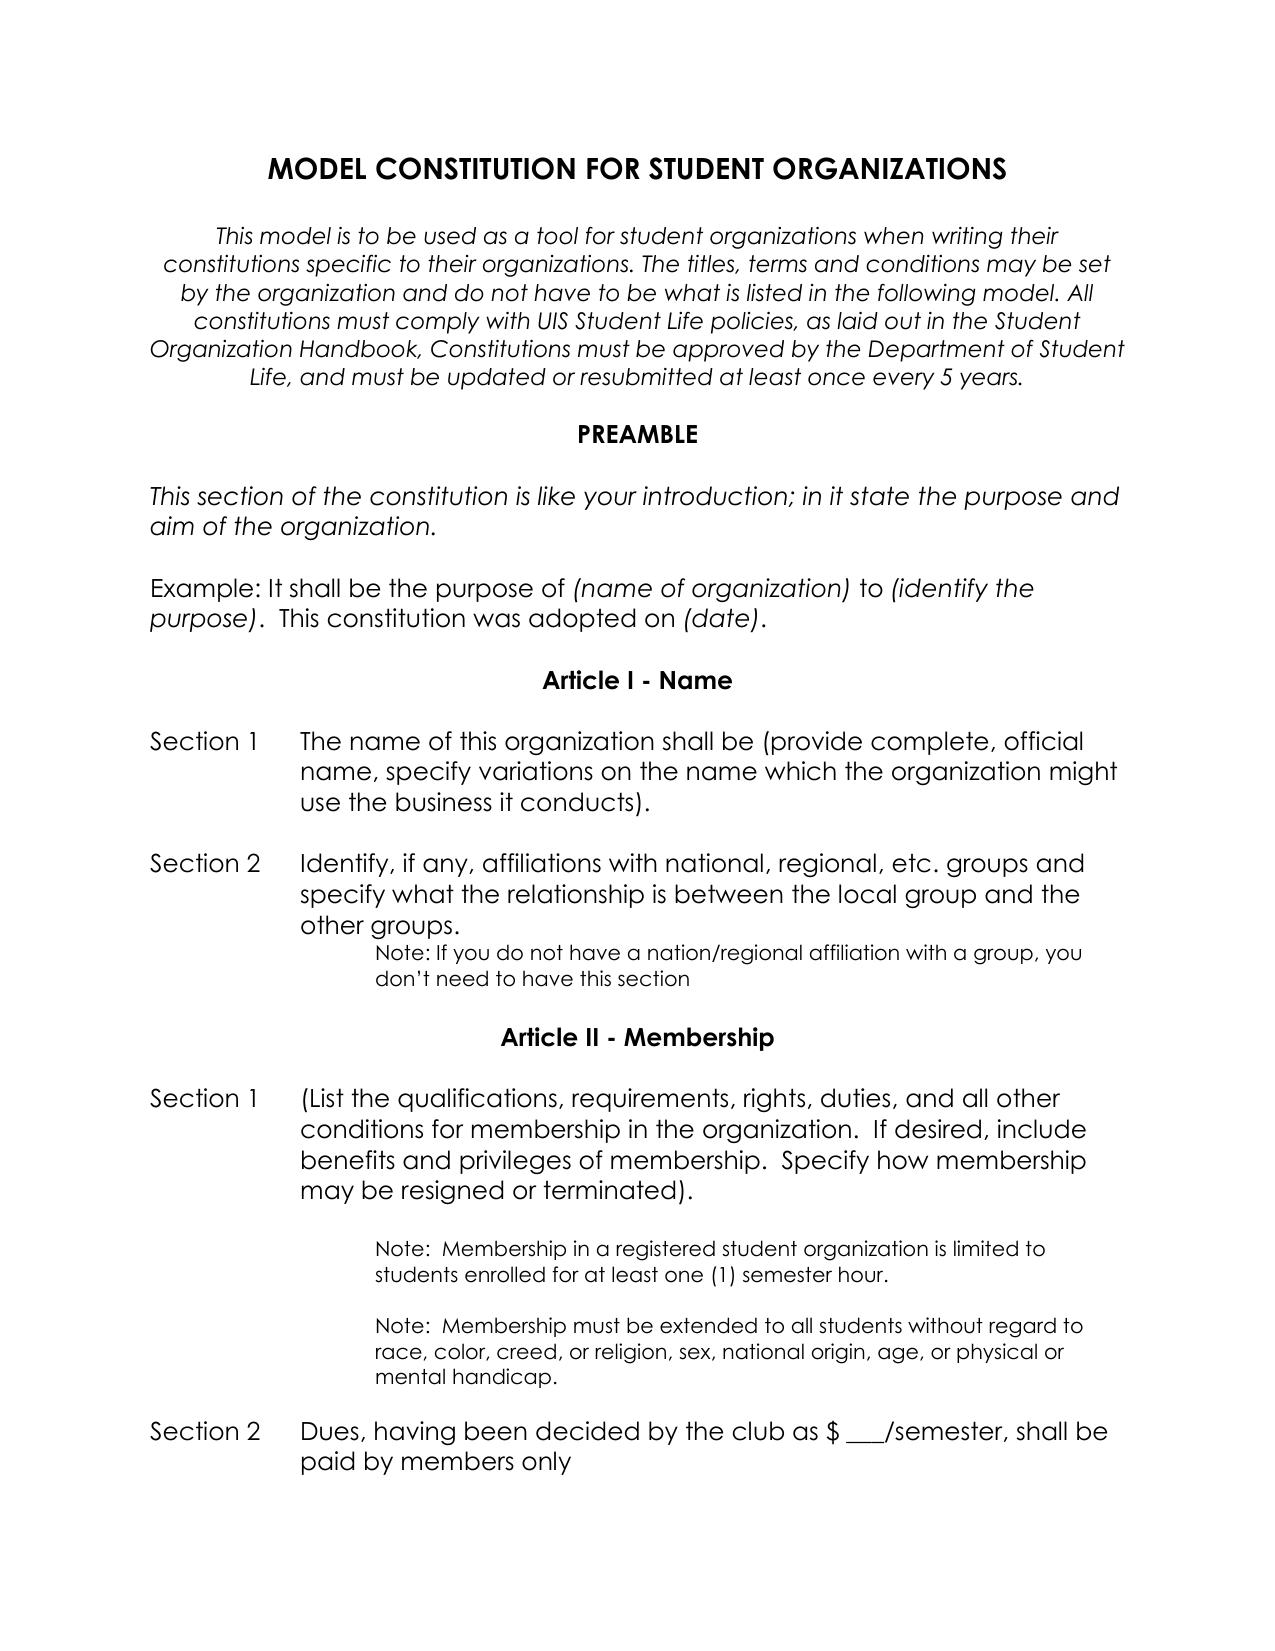 Student organization model constitution doc wajeb Choice Image